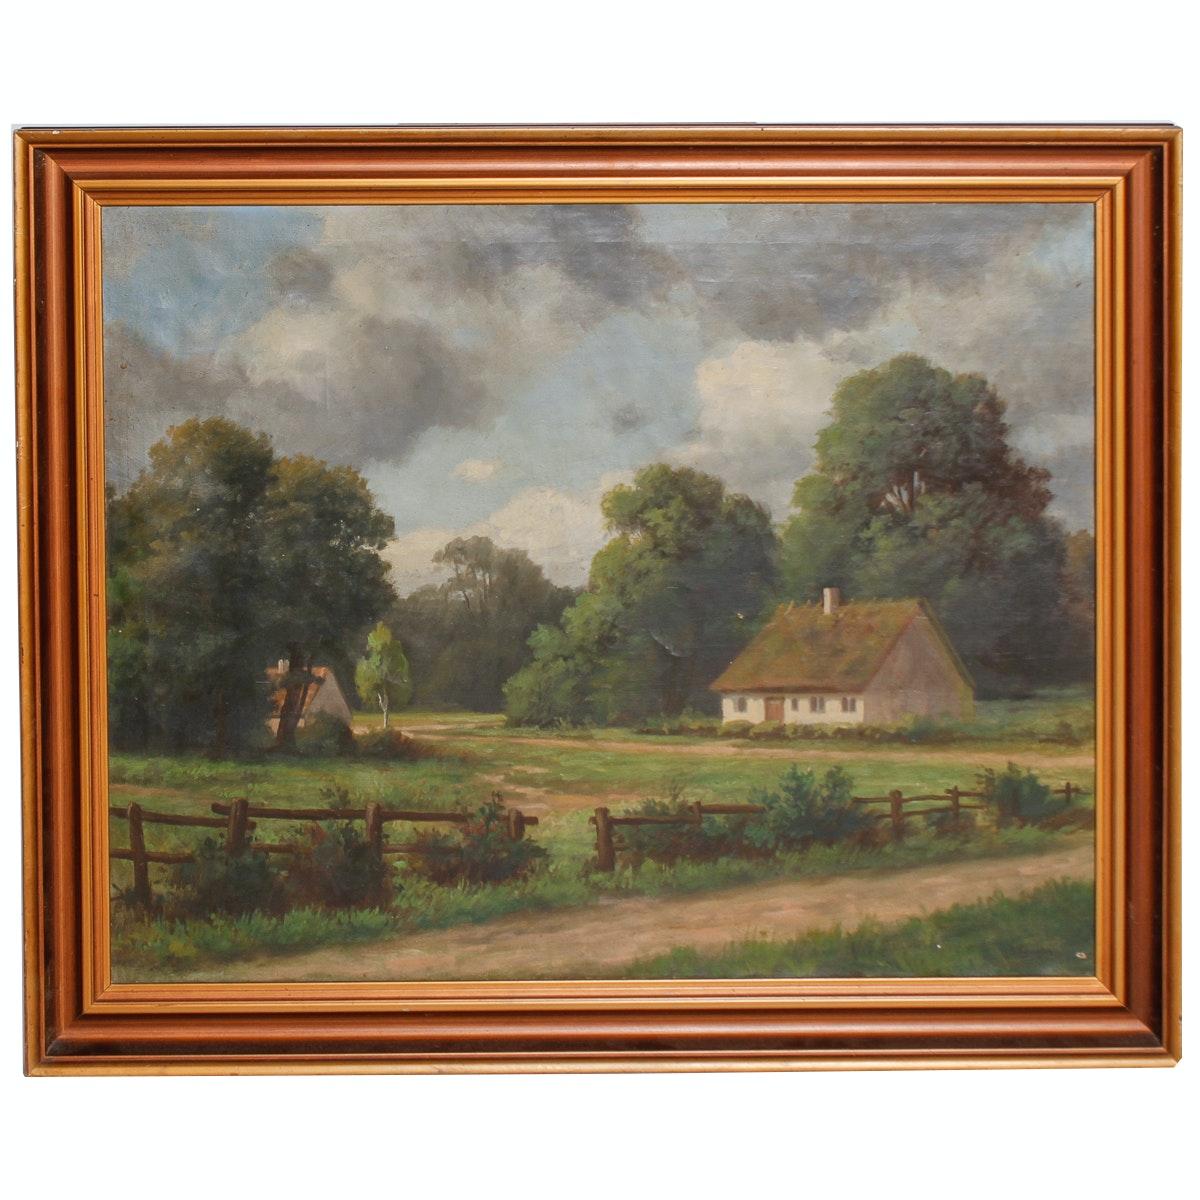 Danish Farm Landscape Oil on Canvas